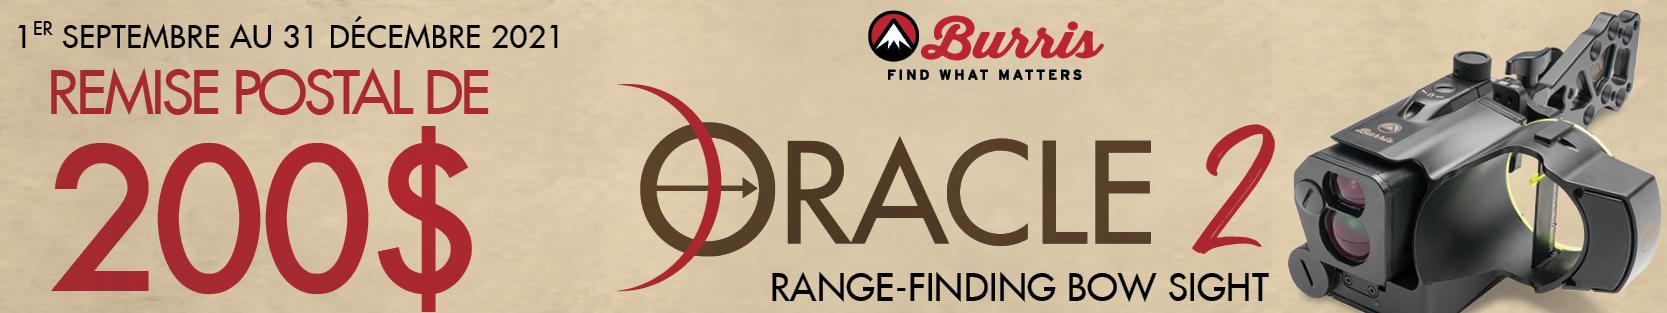 Burris Oracle 2 canada rebate 2021 - Banner French